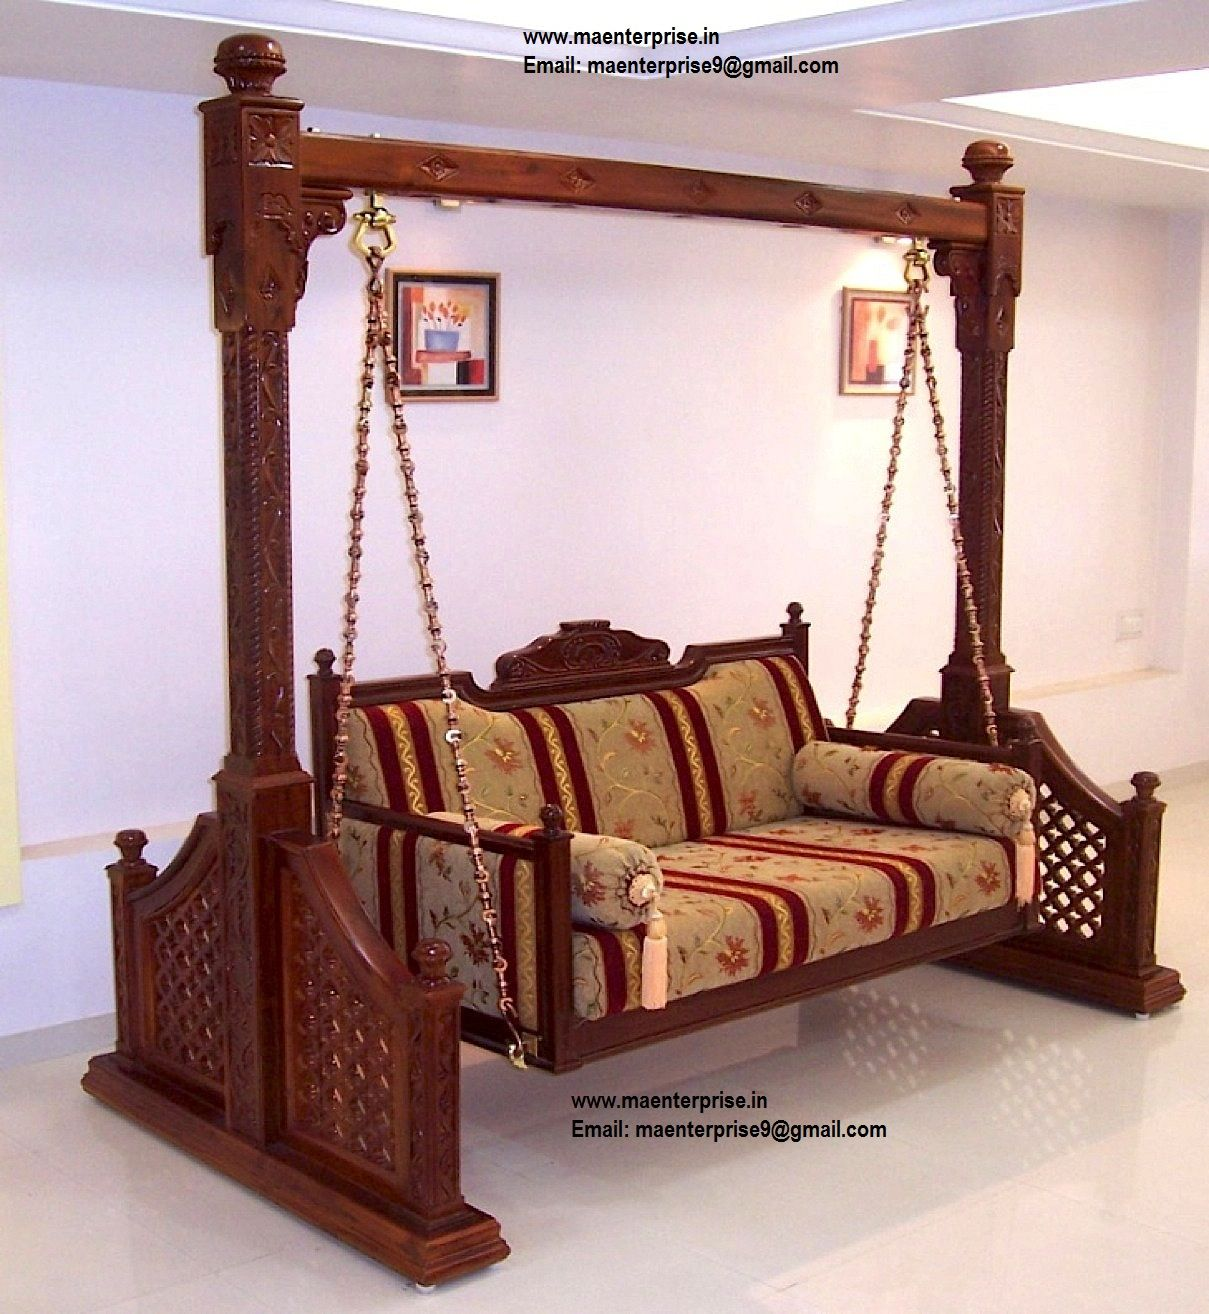 Indian Home Decor Jhoola Swing Jula Pinterest Wooden